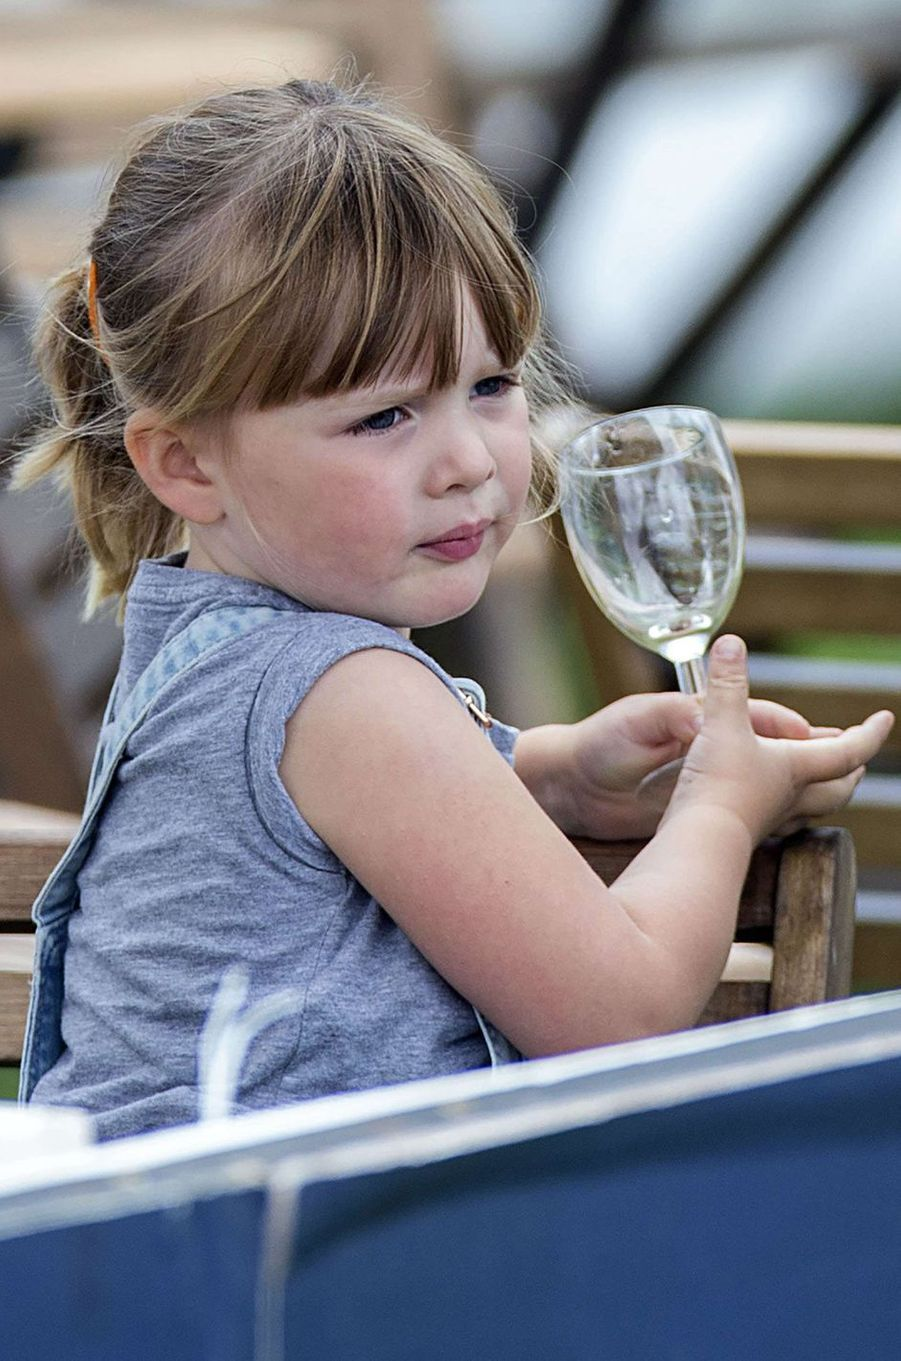 Mia Tindall à Gatcombe Park, le 6 août 2017